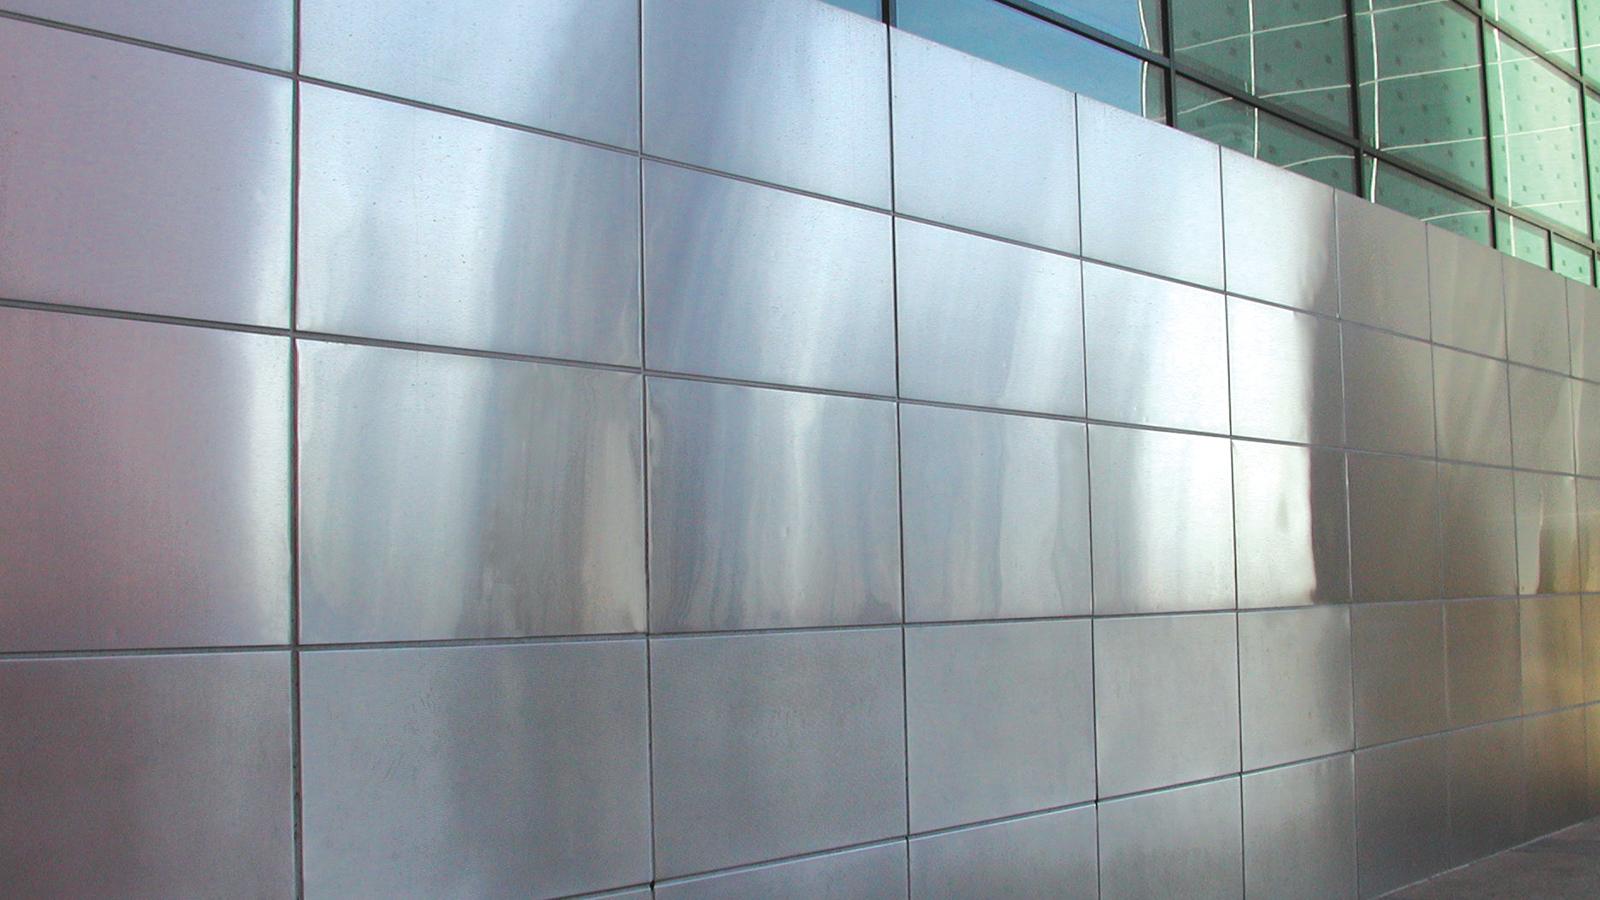 Moz Designer Metals, Keyway Wall Panels, Interior Design, Architecture